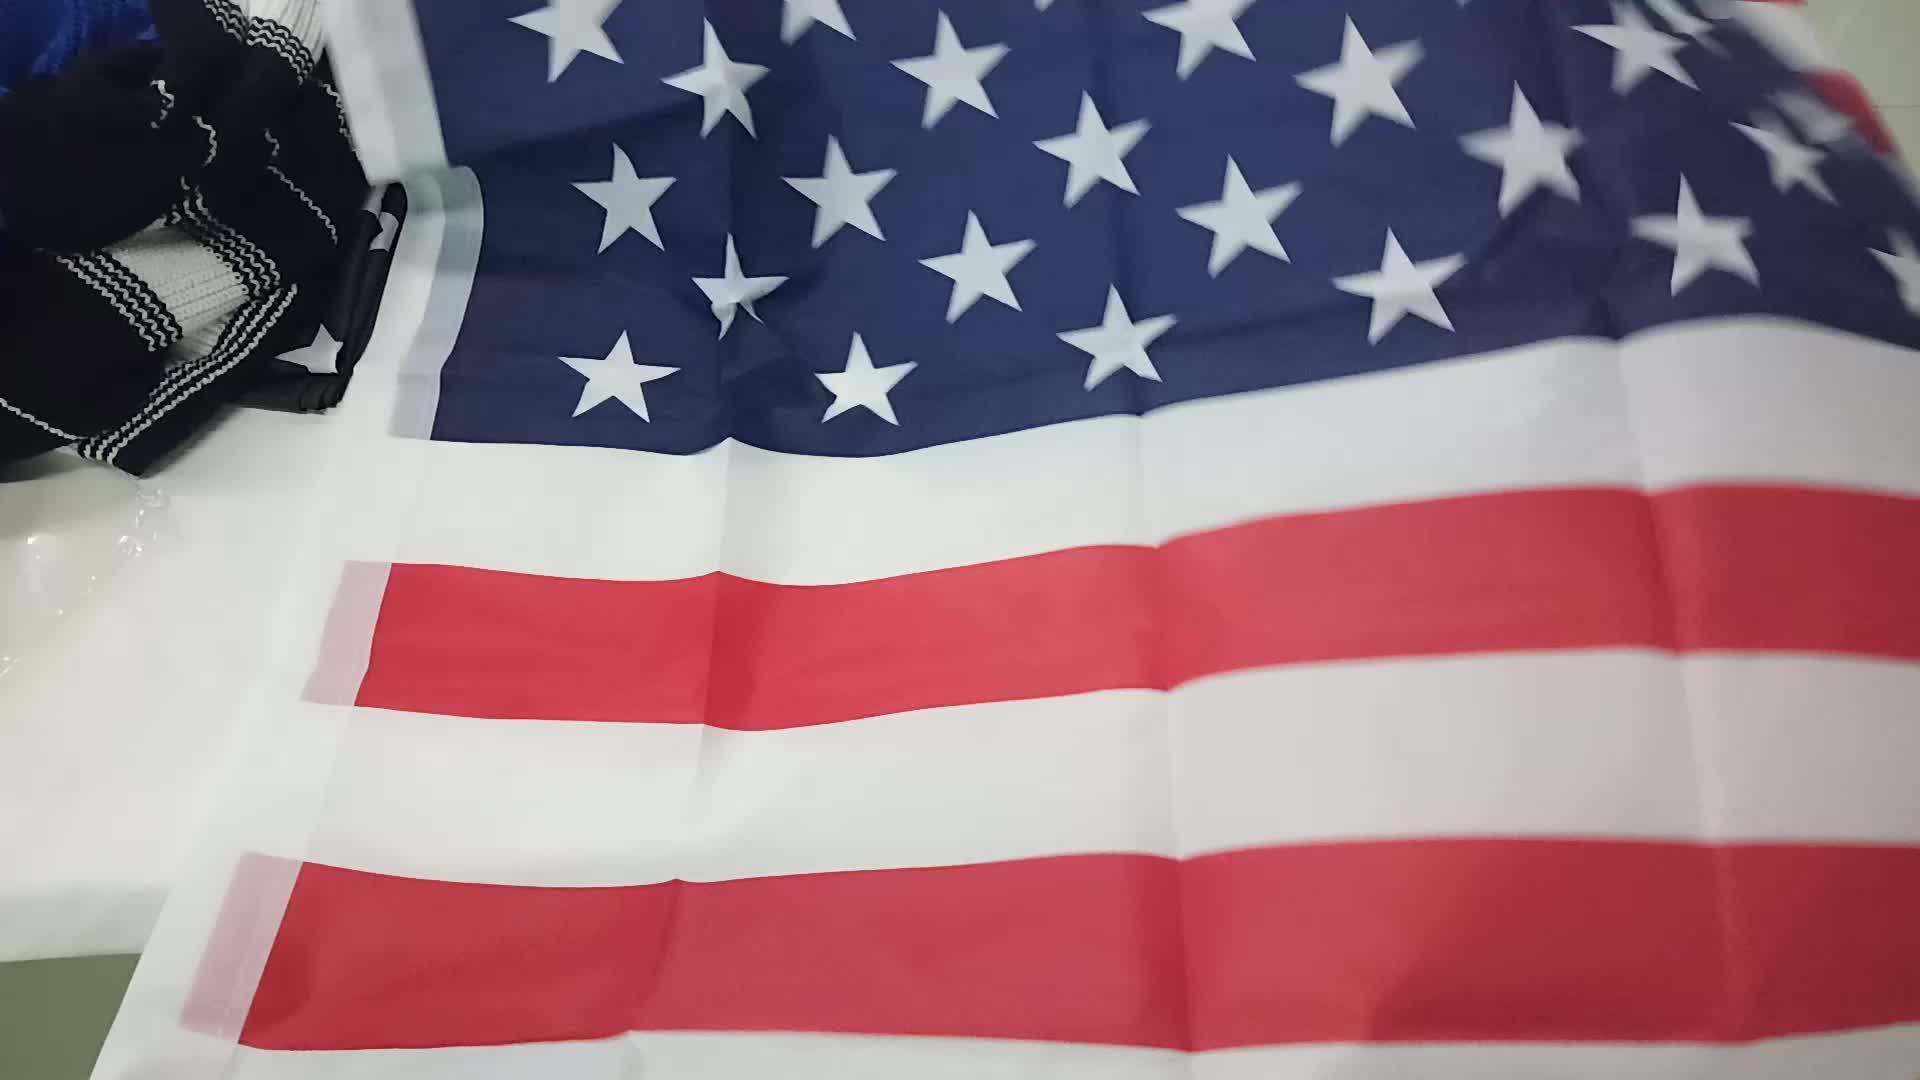 USA البوليستر أمريكا العلم الوطني 3X5ft 150*90 سنتيمتر حية اللون و تتلاشى مقاومة الأمريكية علم الدولة للديكور في الهواء الطلق